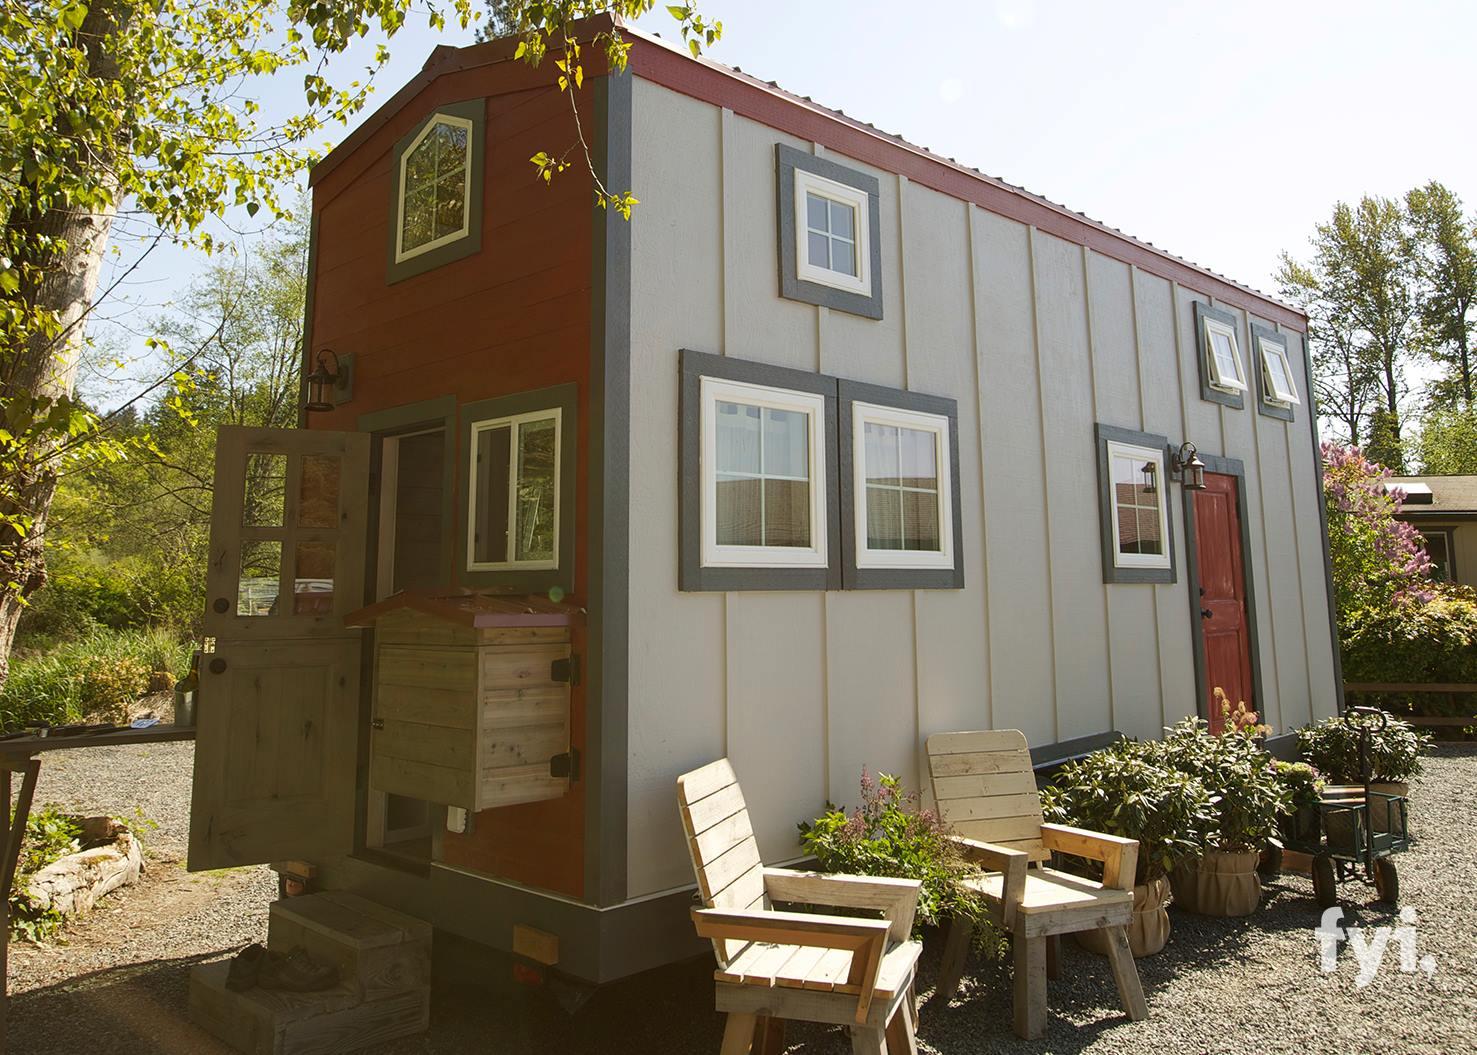 barn chic tiny house 300 sq ft tiny house town